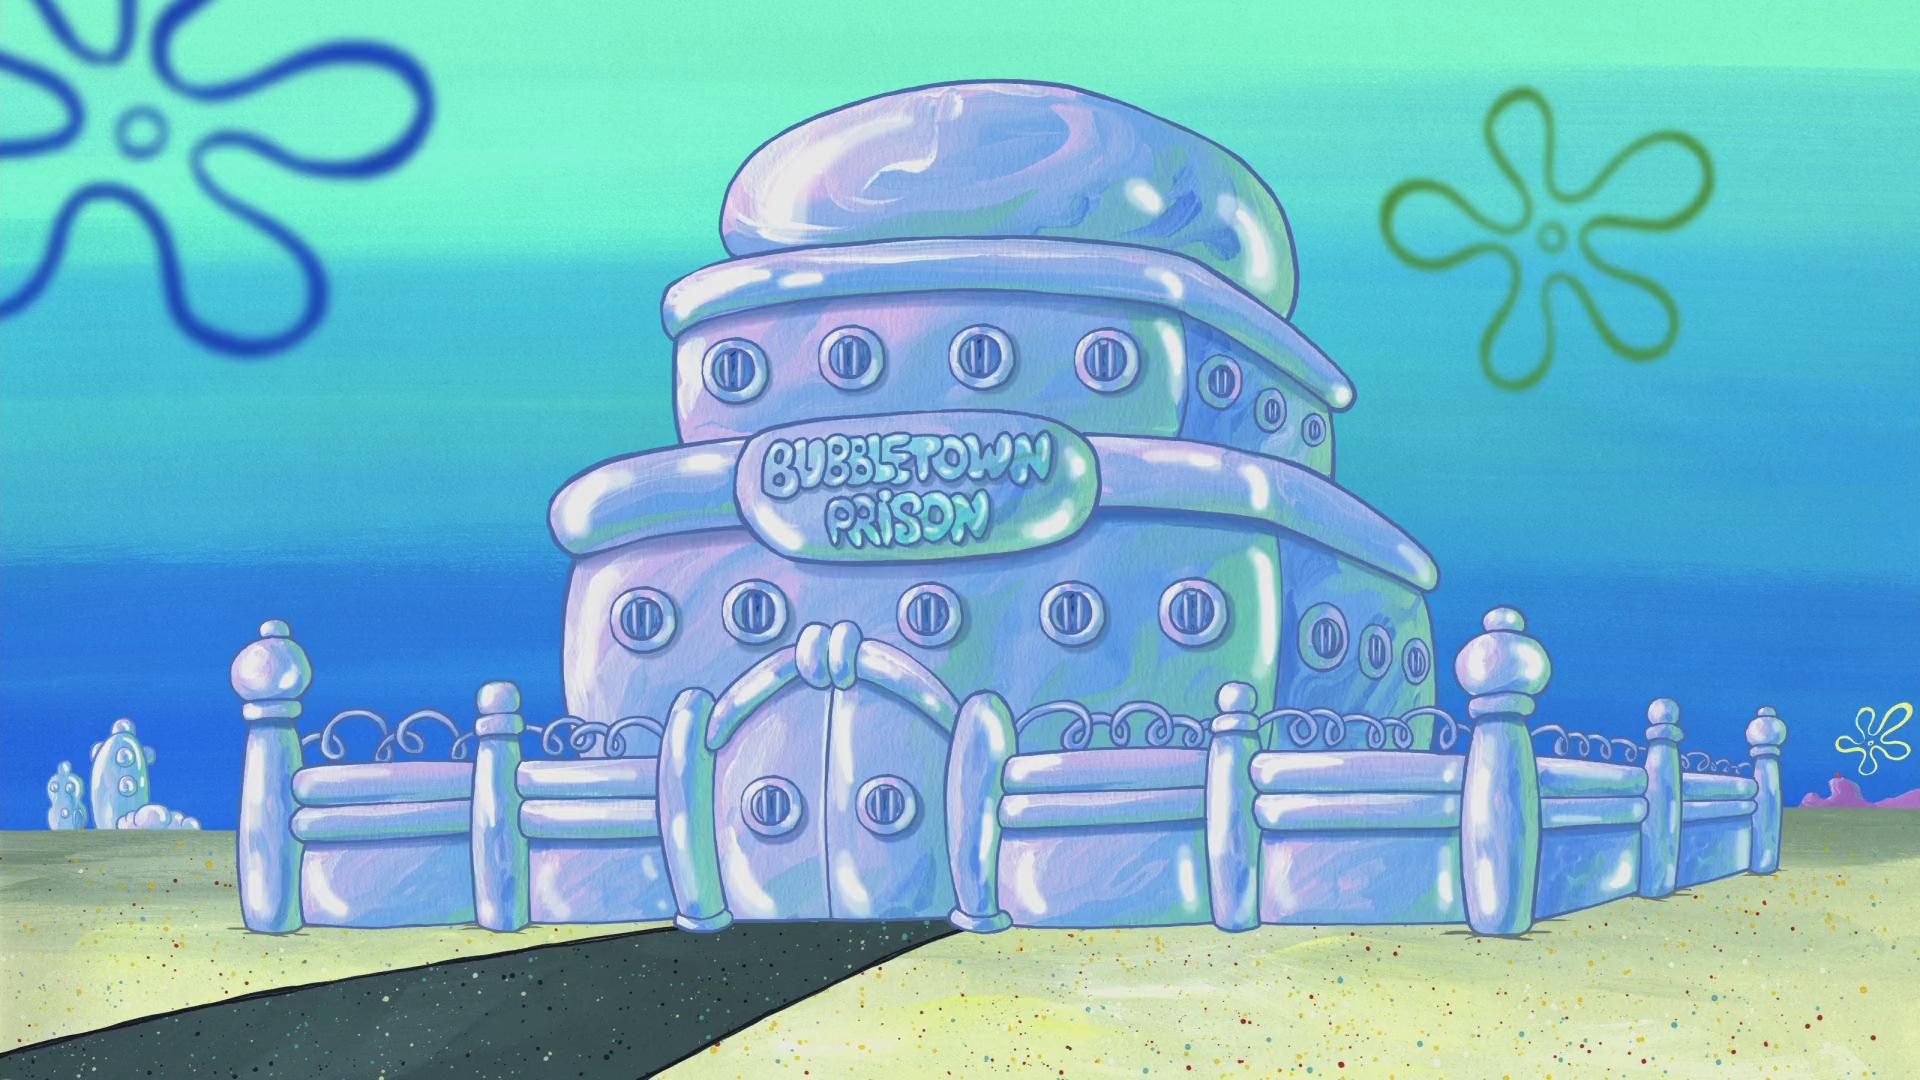 Bubbletown Prison